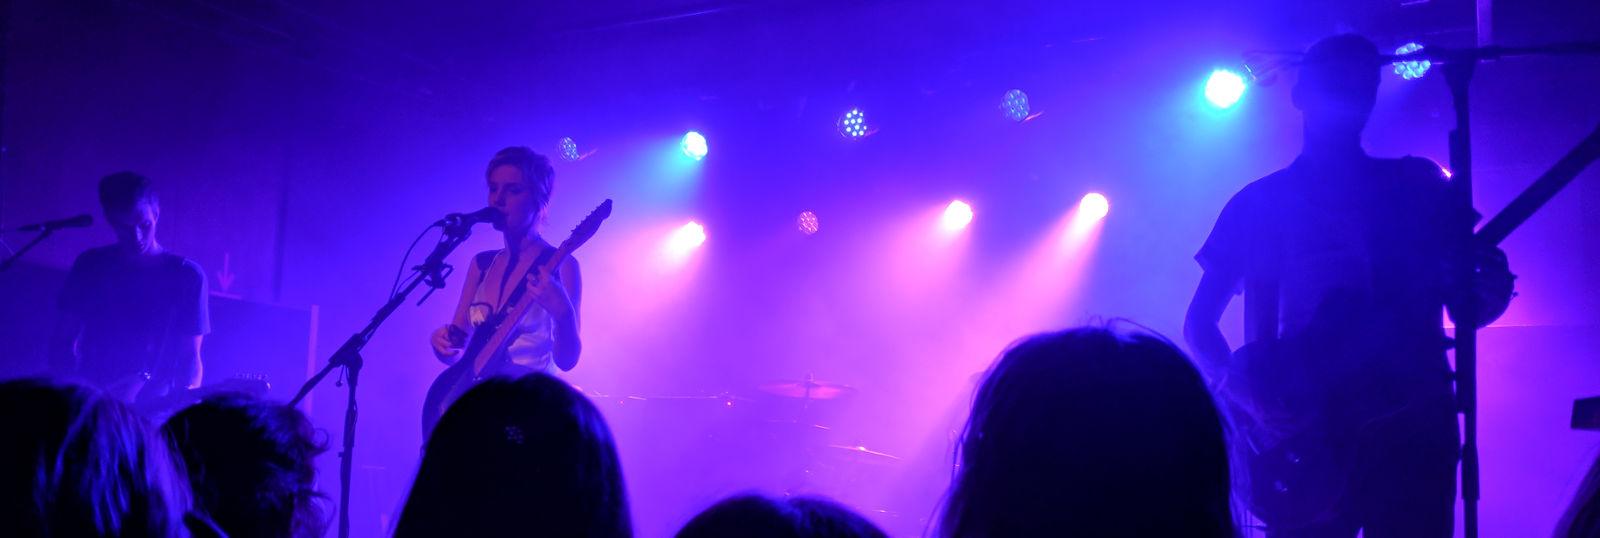 Wolf Alice, live 2018.01.19 in Lille Vega, Copenhagen